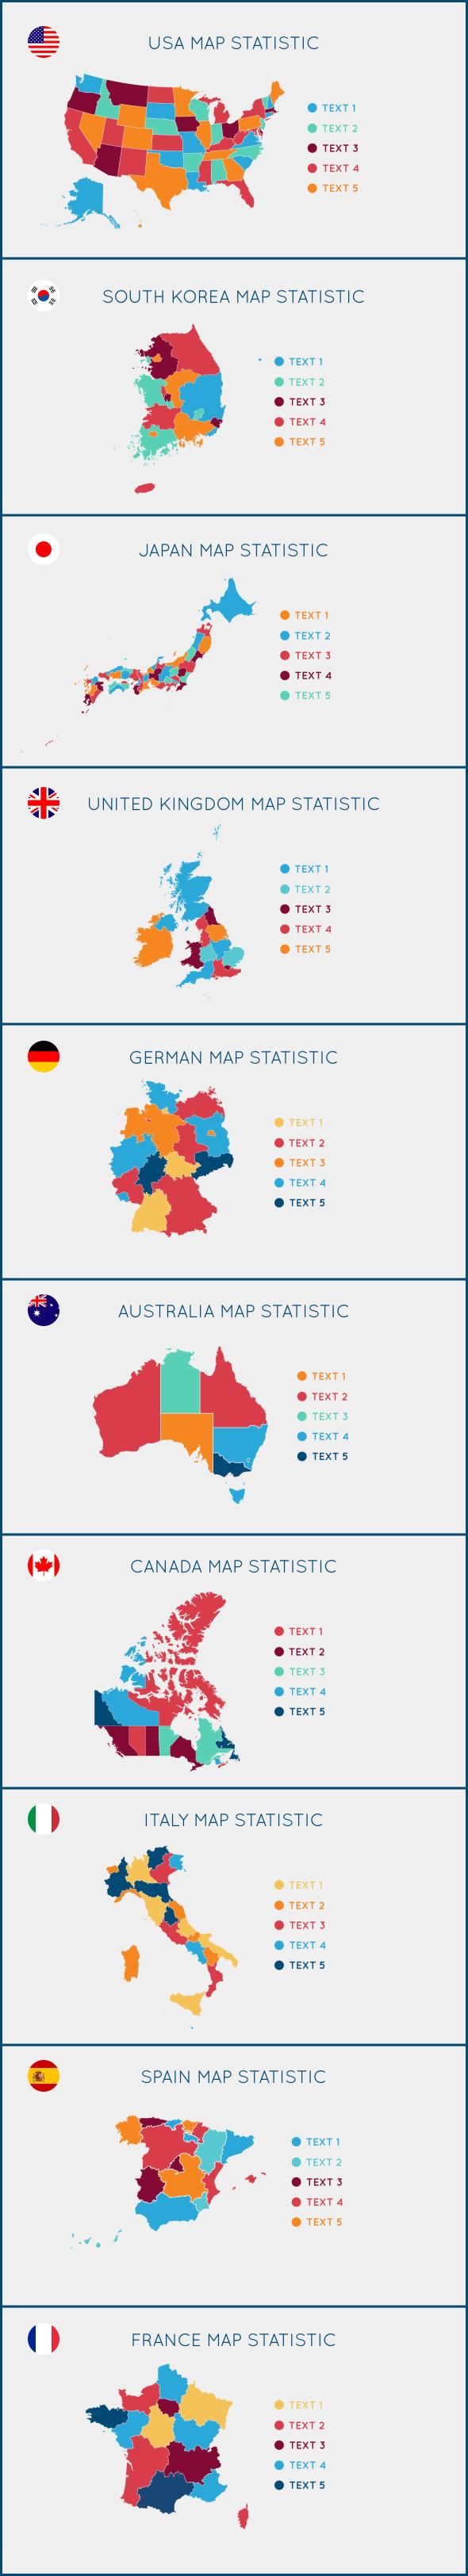 Statistic Maps